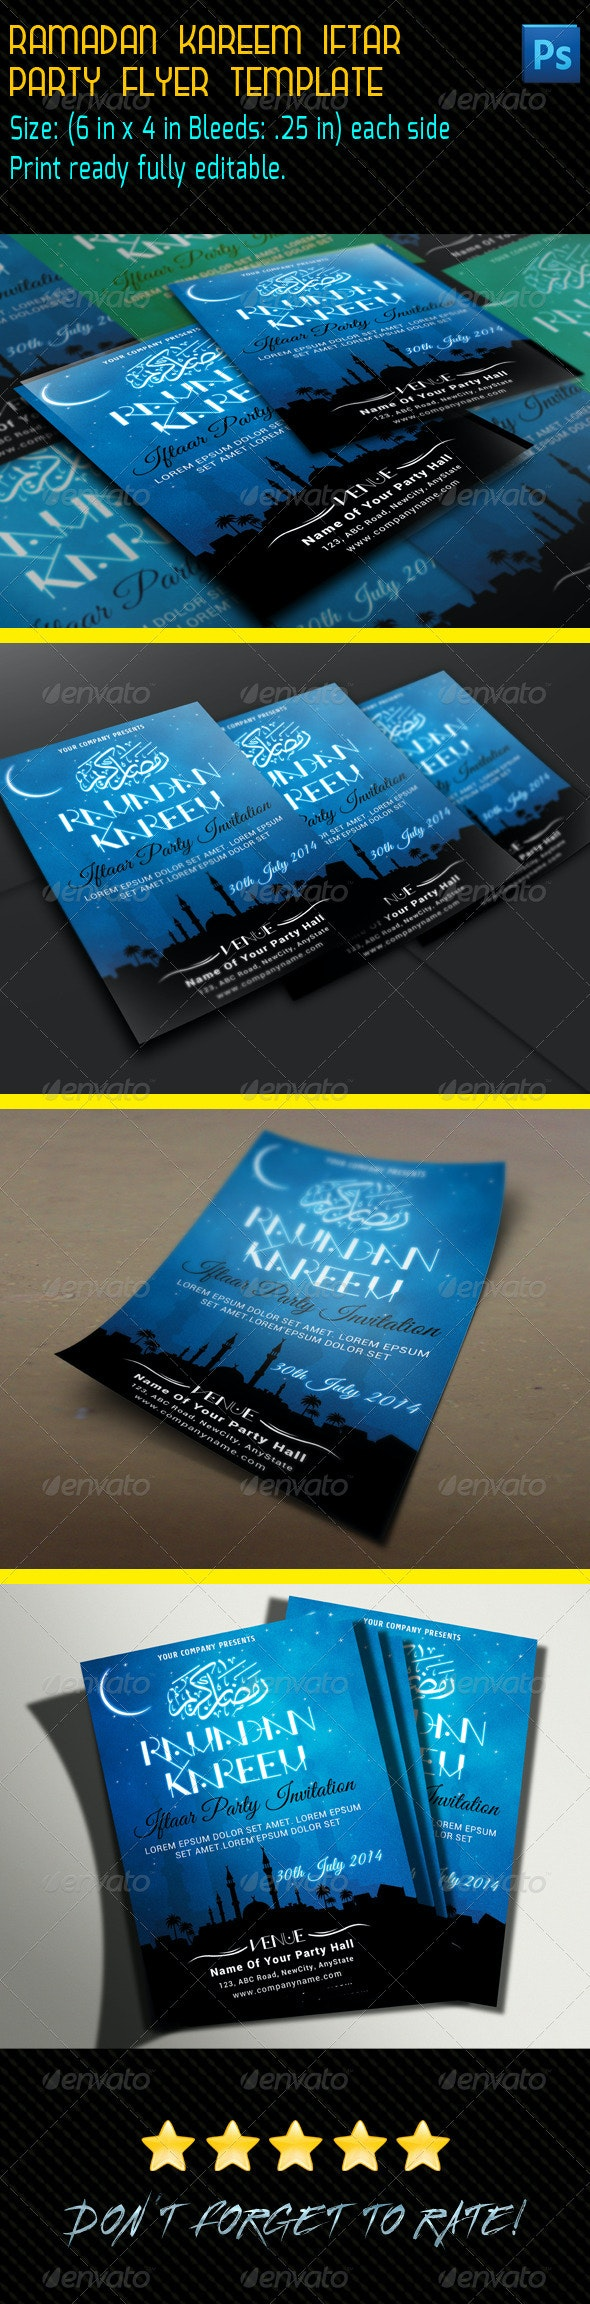 Ramadan Kareem Iftar Party Flyer - Print Templates